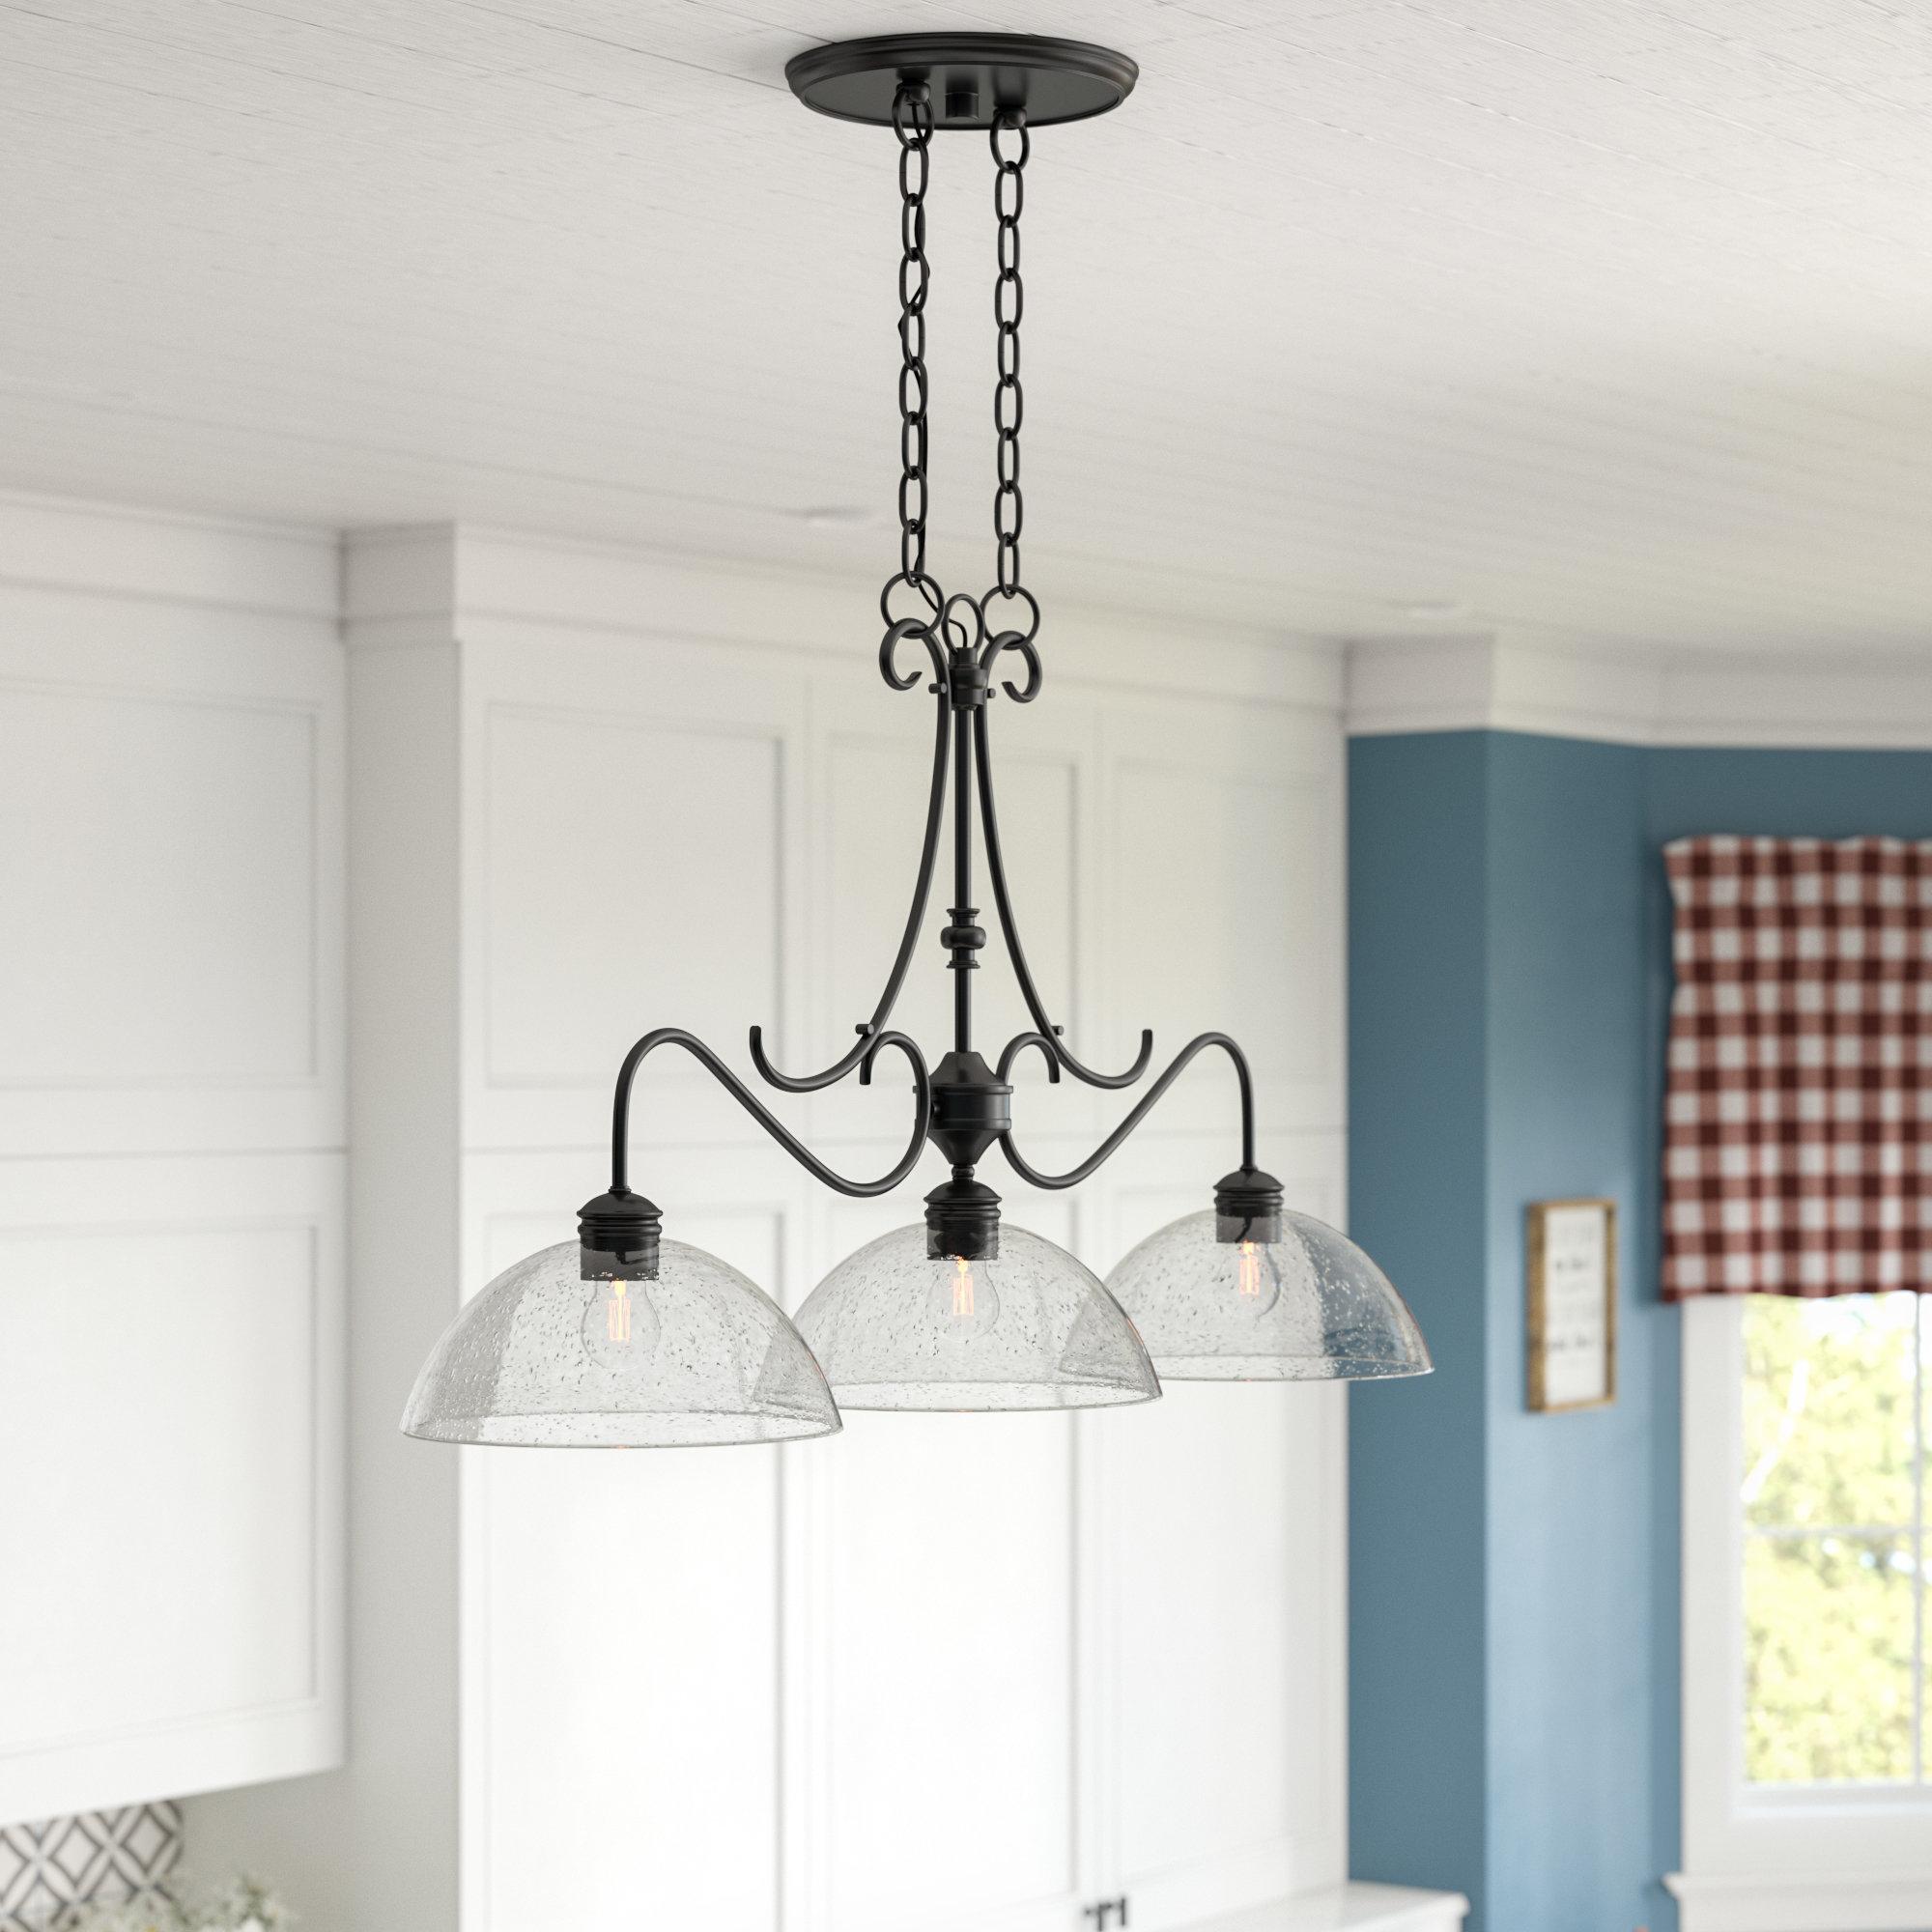 Grullon Scroll 1 Light Single Bell Pendants In Preferred Sheila 3 Light Kitchen Island Dome Pendant (View 14 of 25)